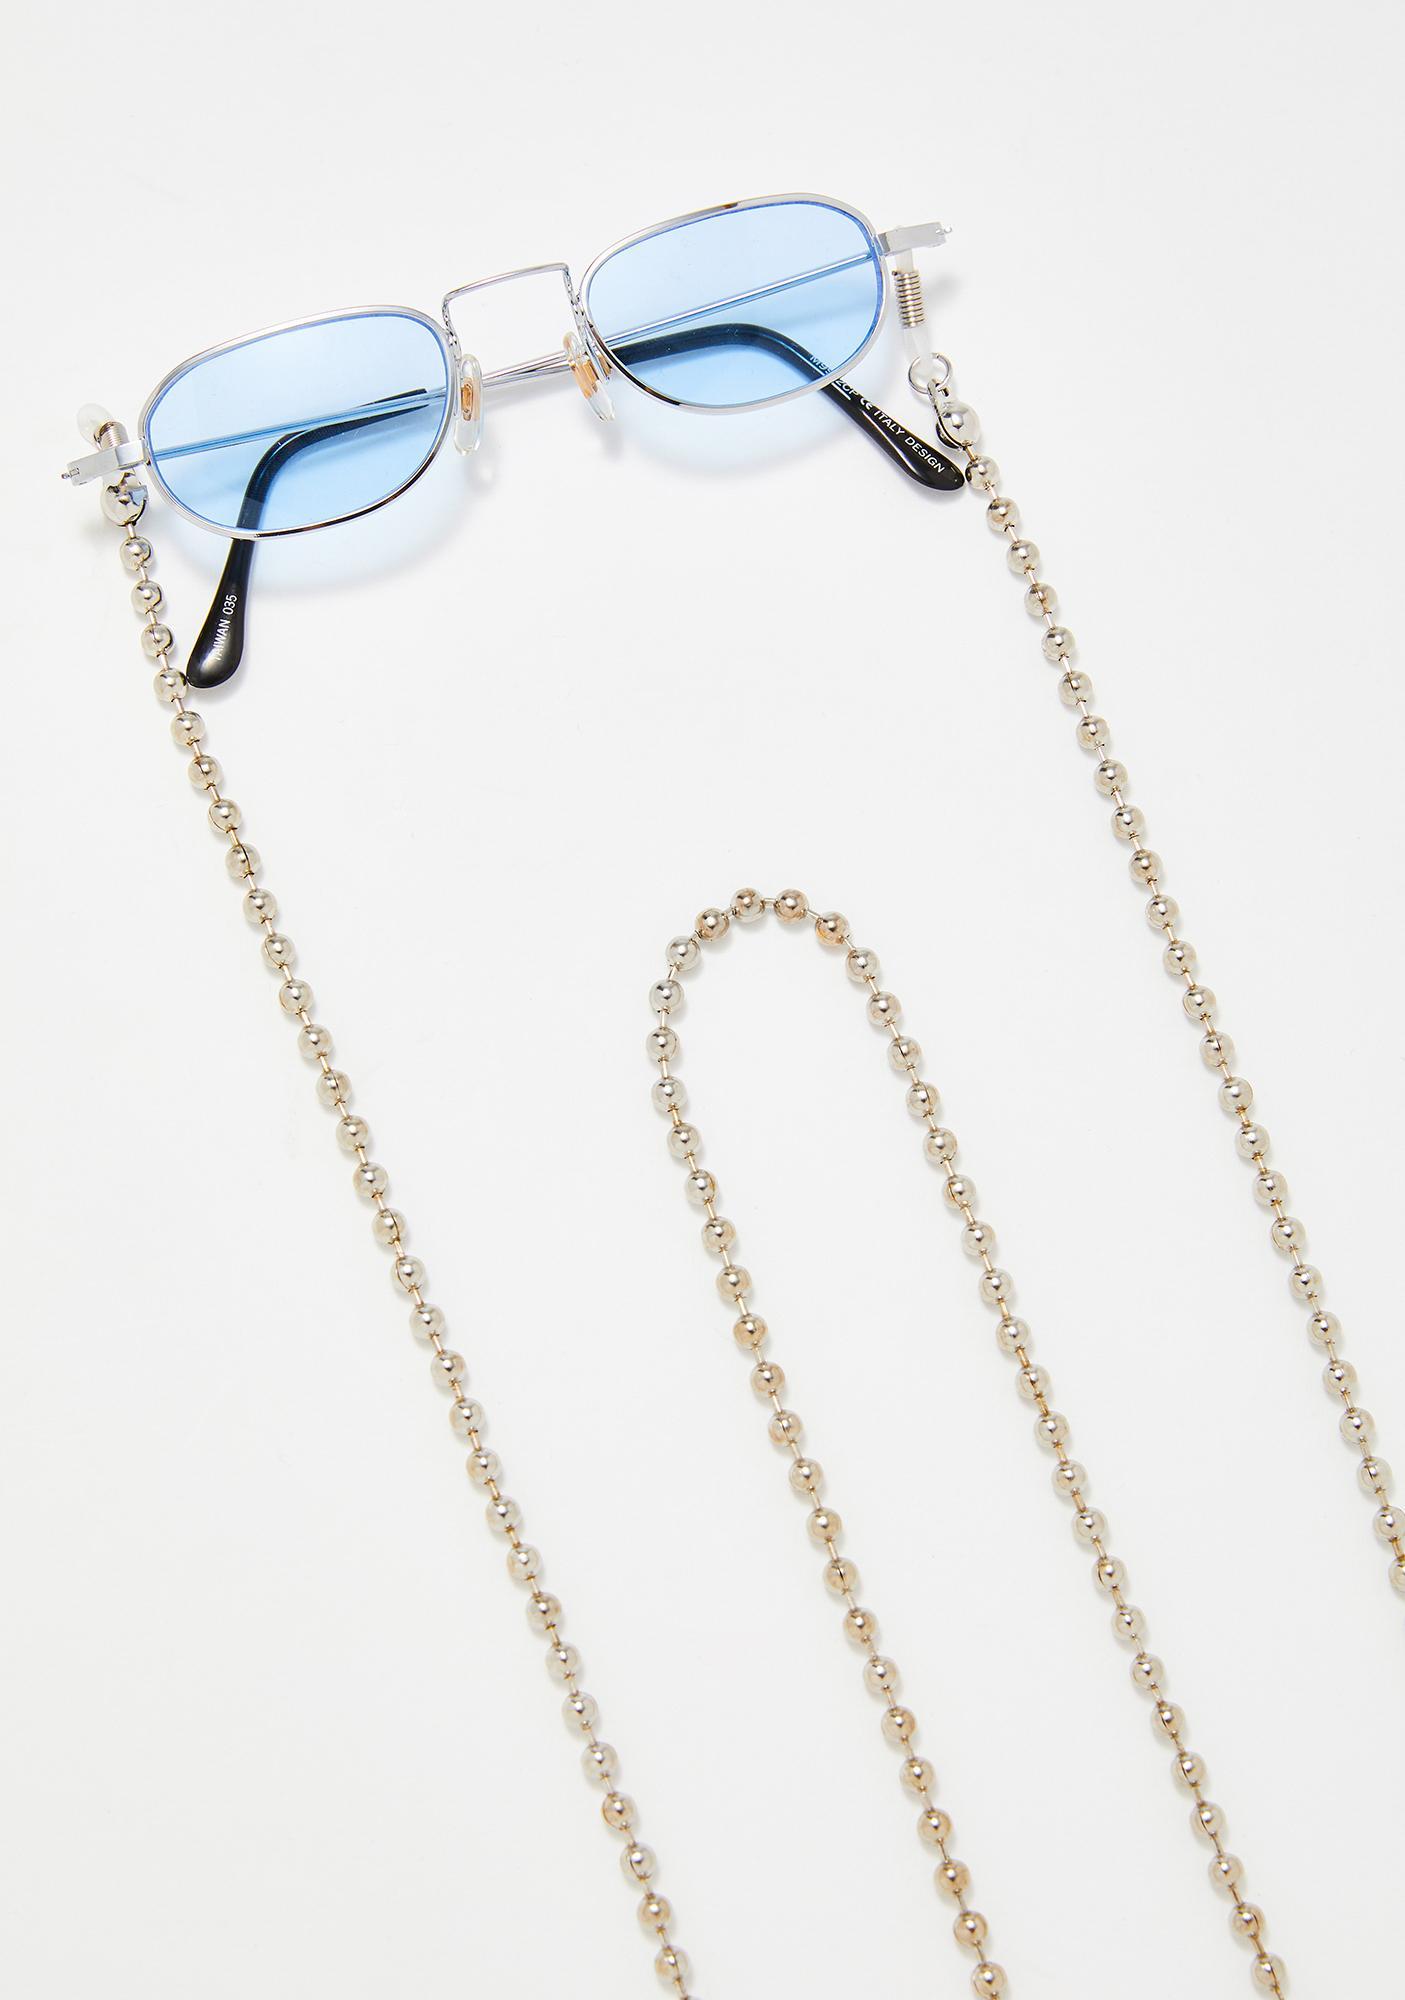 Ballin' On You Sunglasses Chain